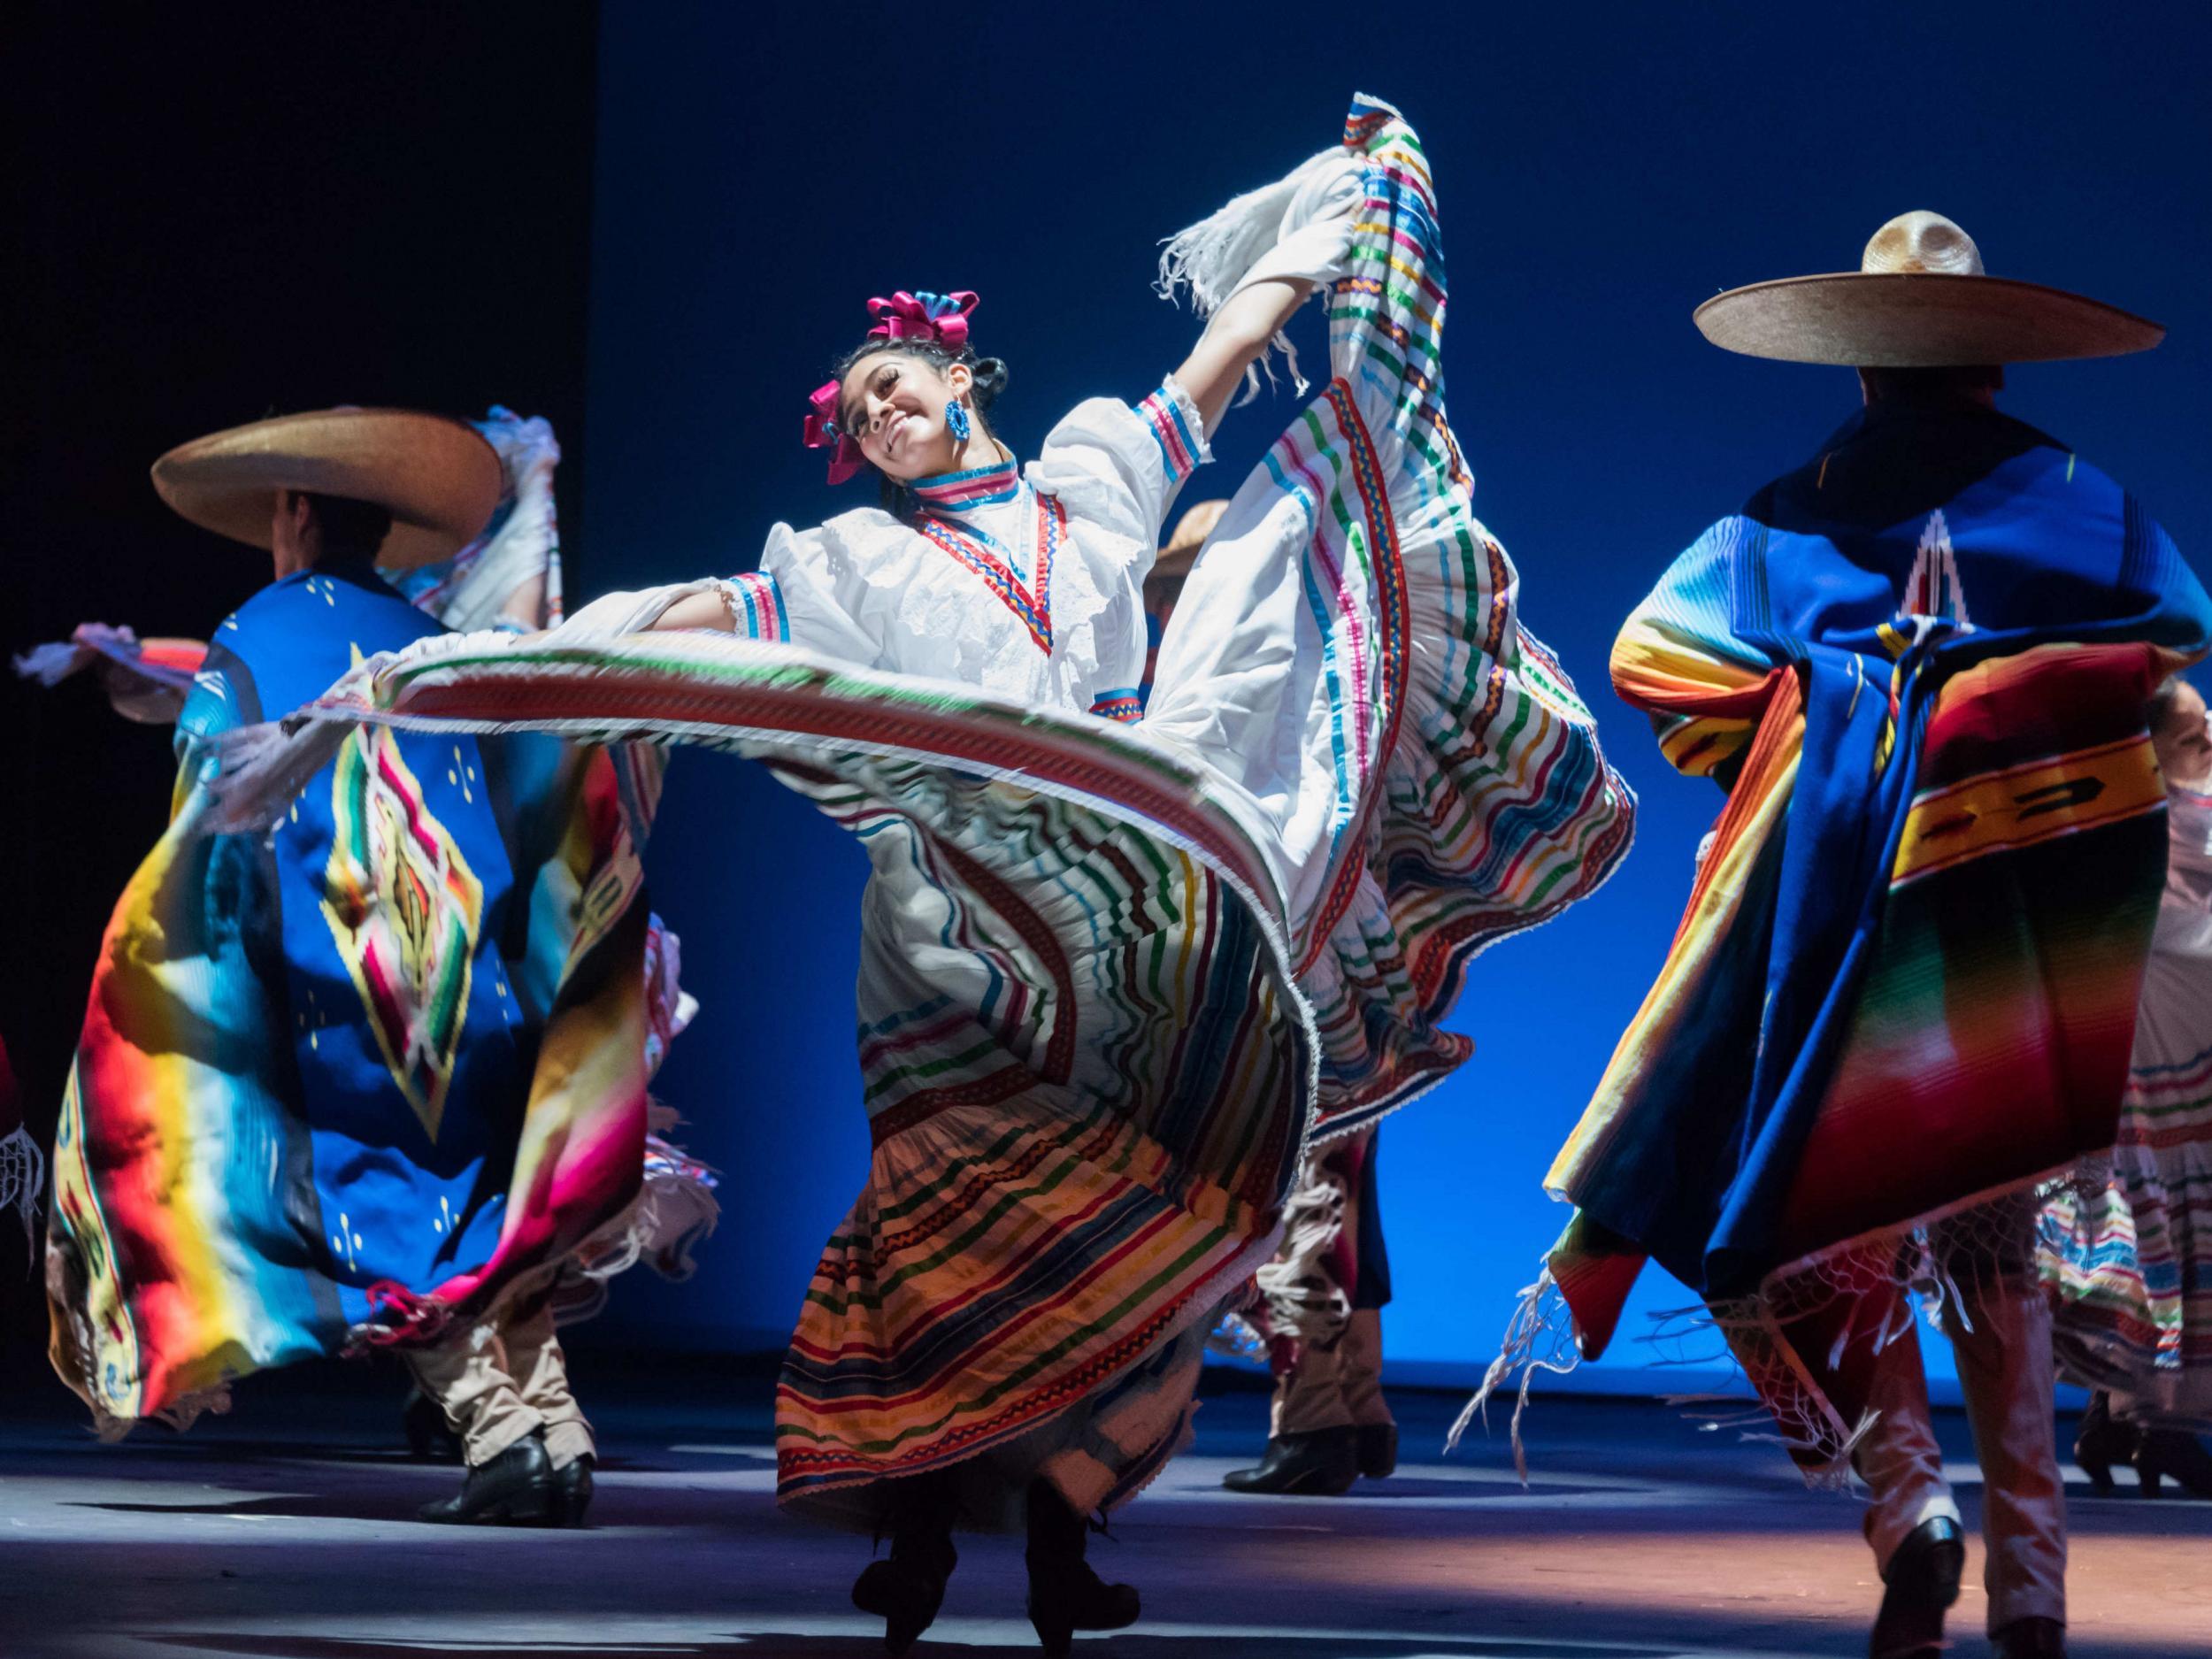 Amalia Hernandez: The choreographer whose spectacular folk ...